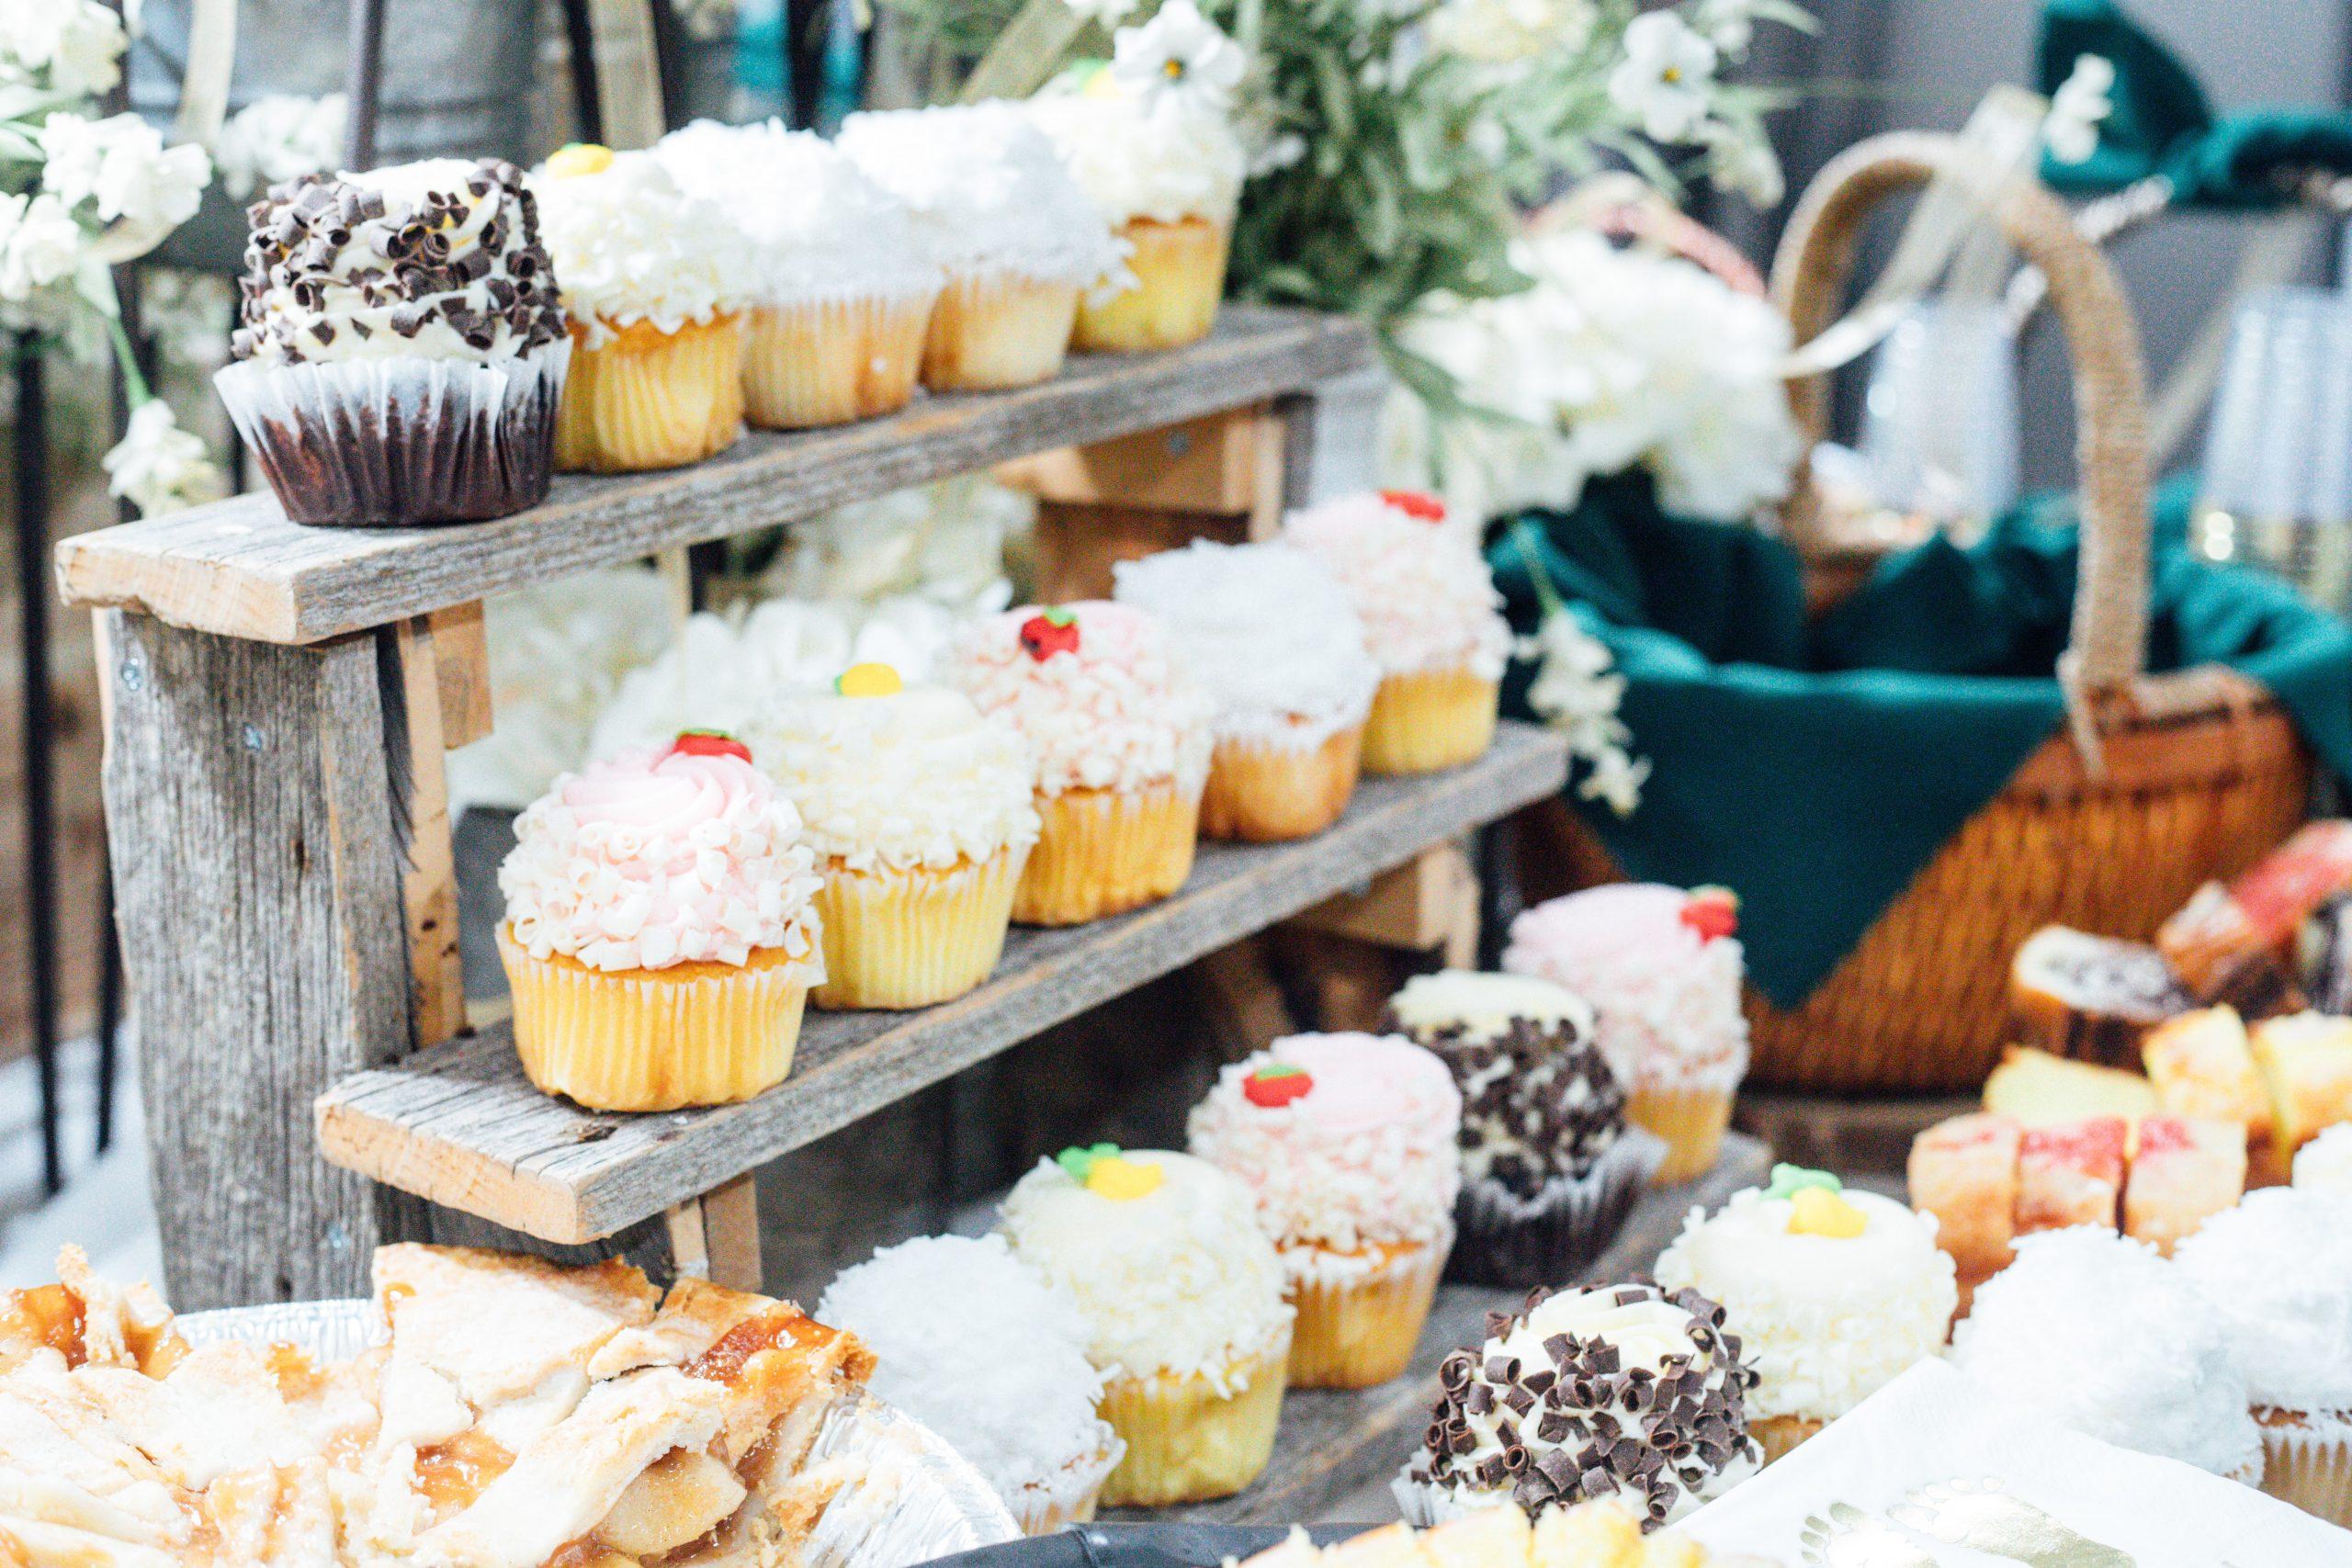 Create a cake bakery business plan